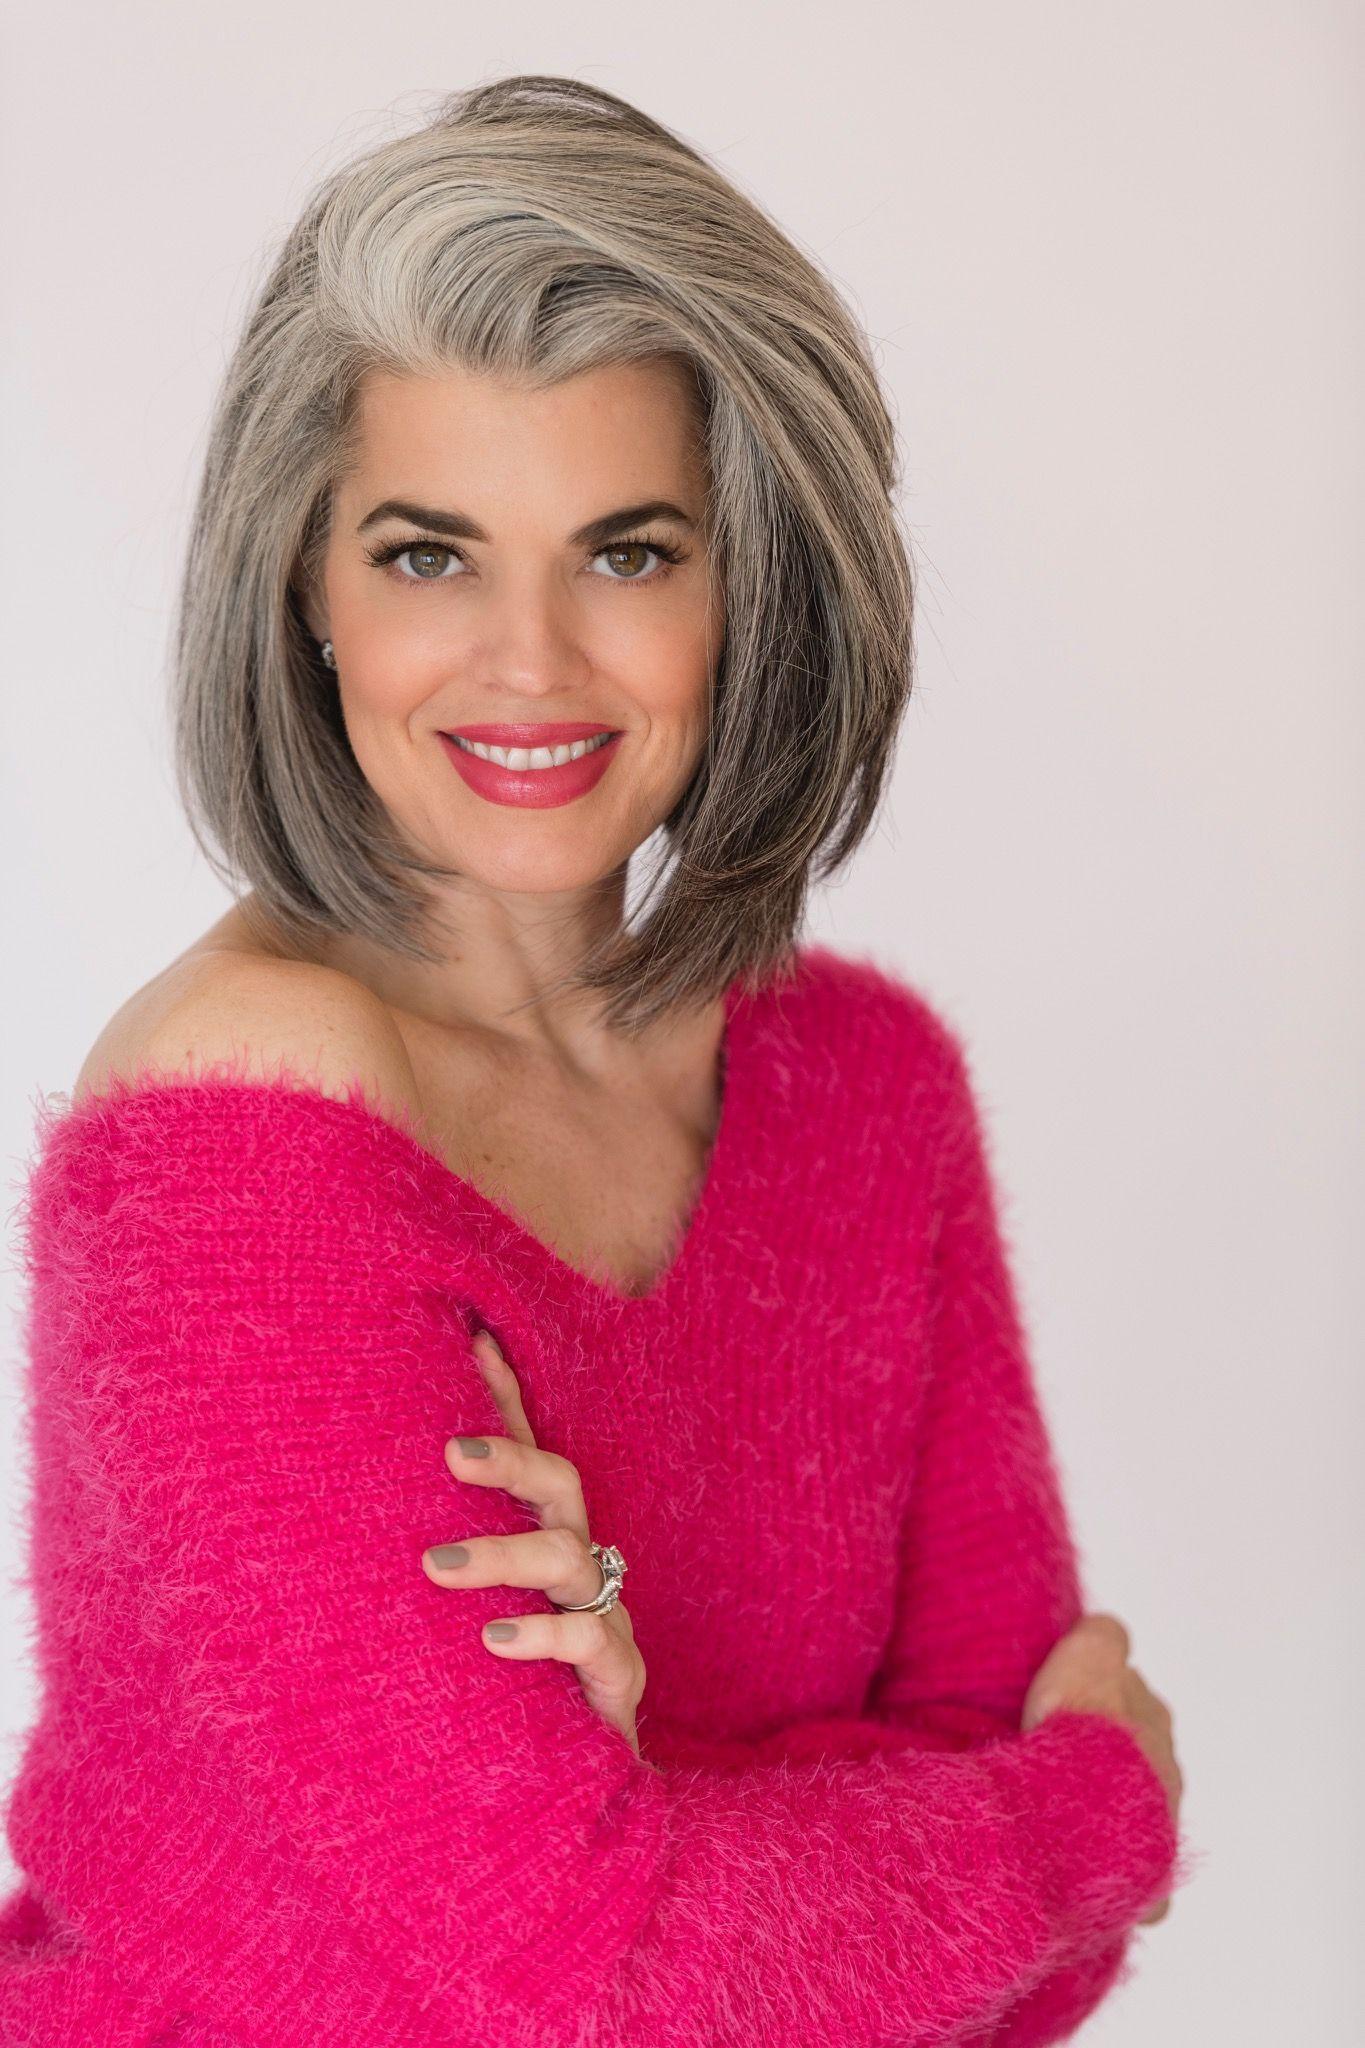 Permanent Makeup Artist Florida & Permanent Makeup Miami